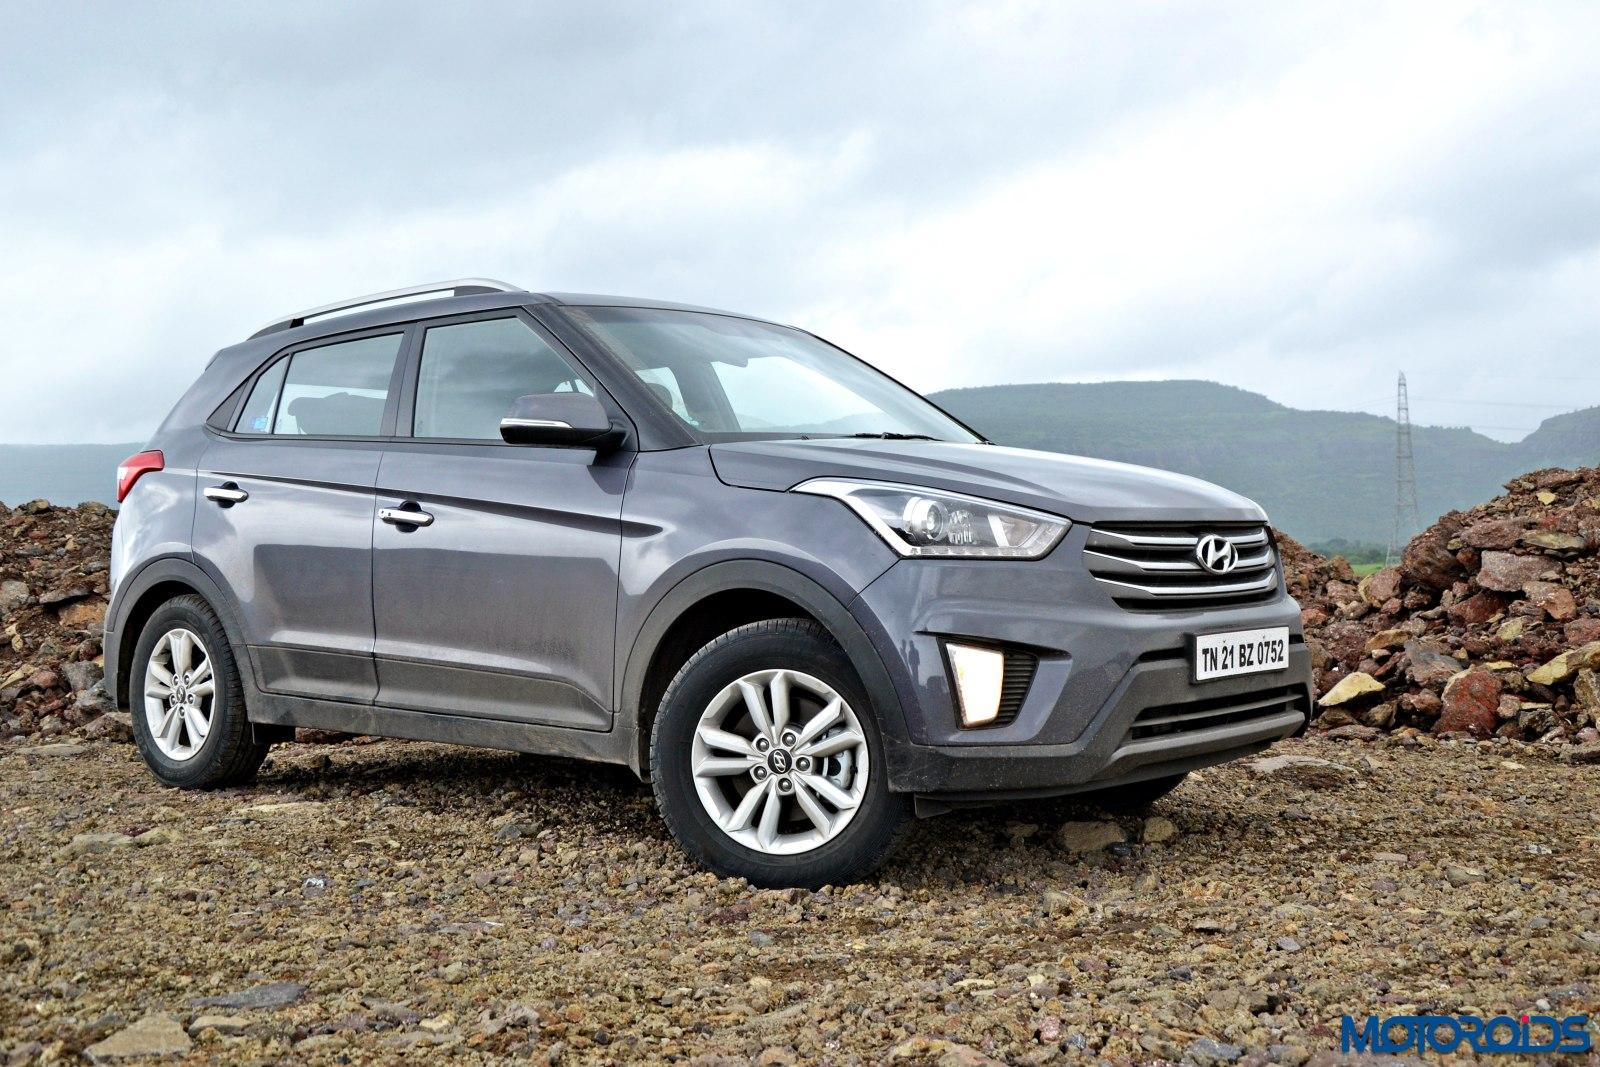 Car Sales September 2015 Hyundai Motor India Records 21 3 Percent Growth In Domestic Sales